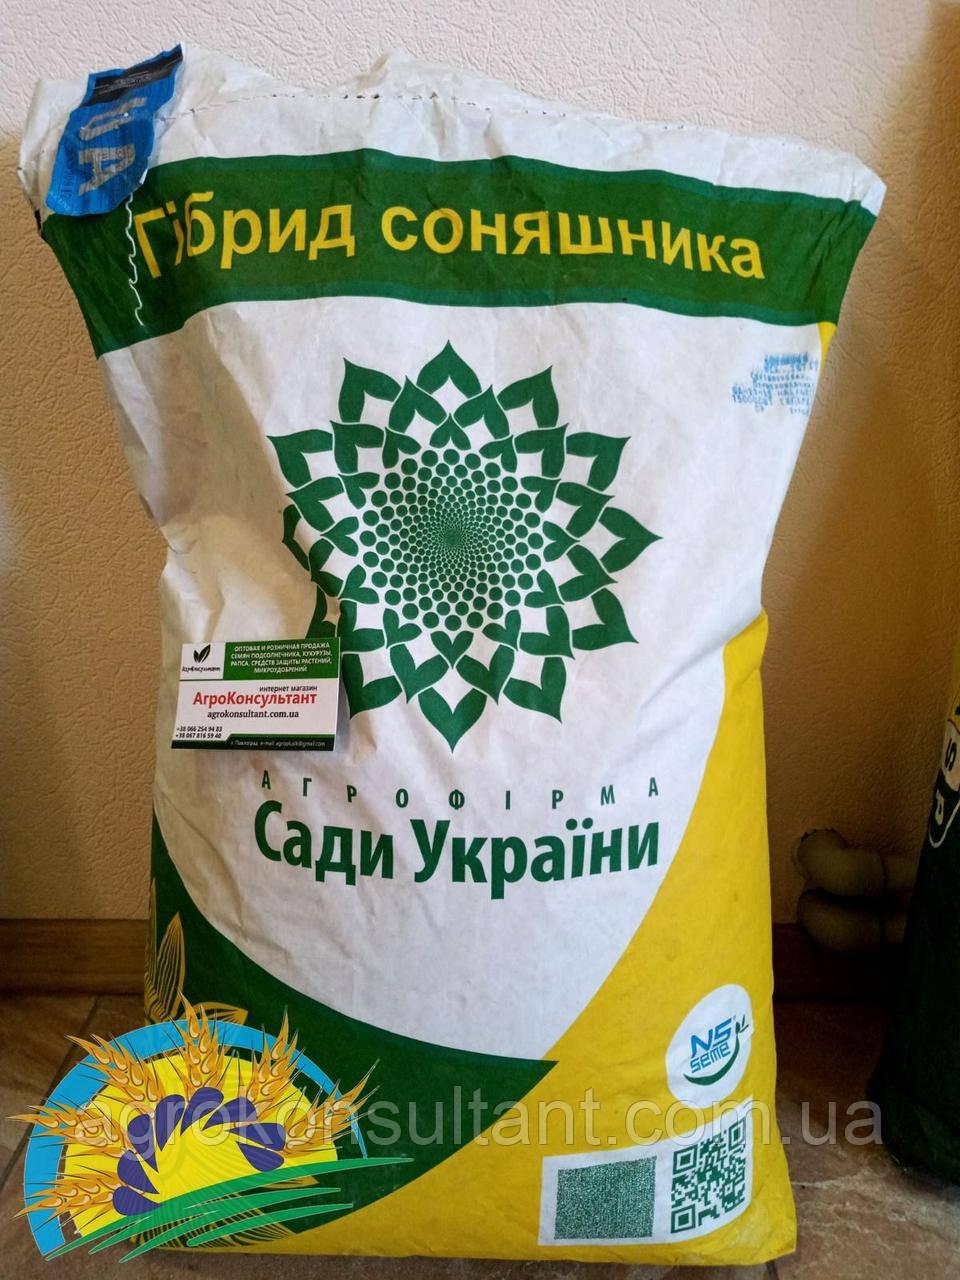 НС Х 26749 (Латитуда) (экстра, урожай 2019 года, Укр.) 8,3кг - семена подсолнечника (150000 шт). СУ